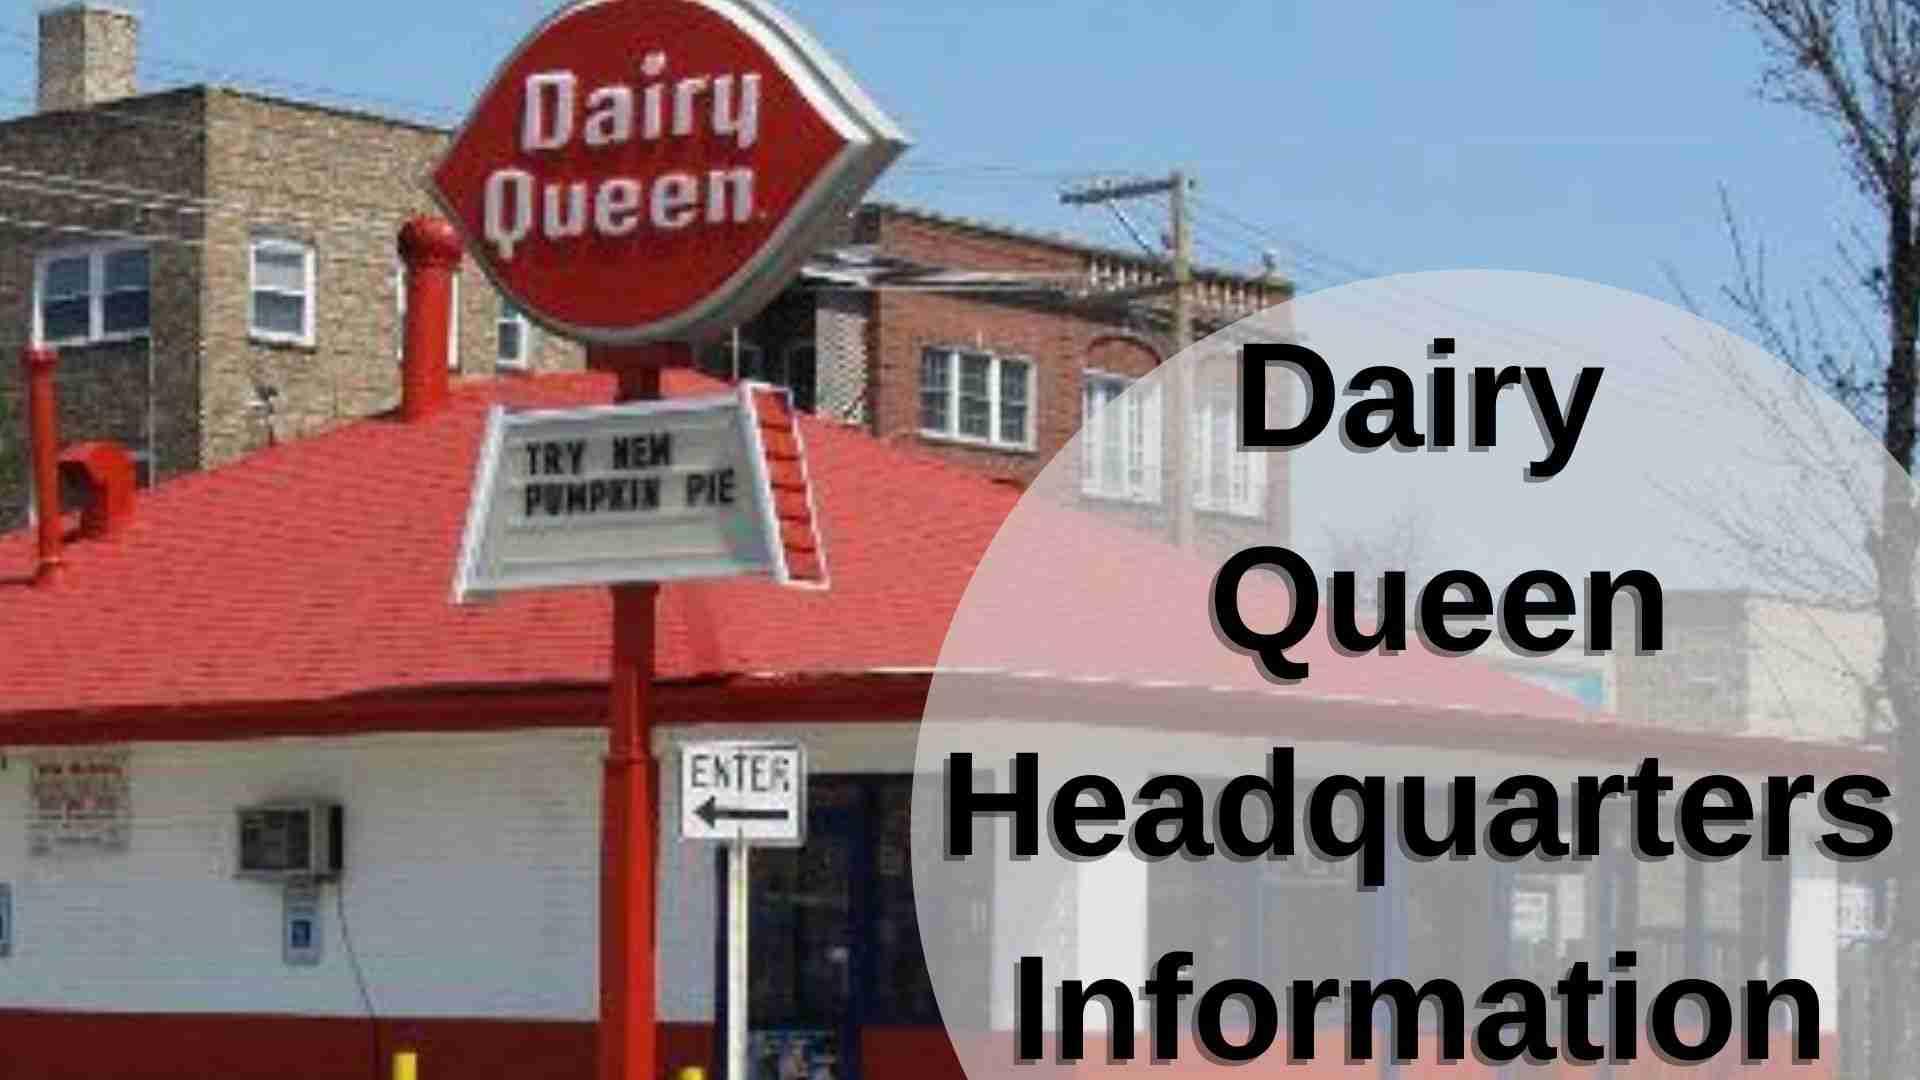 Dairy Queen Headquarters Information